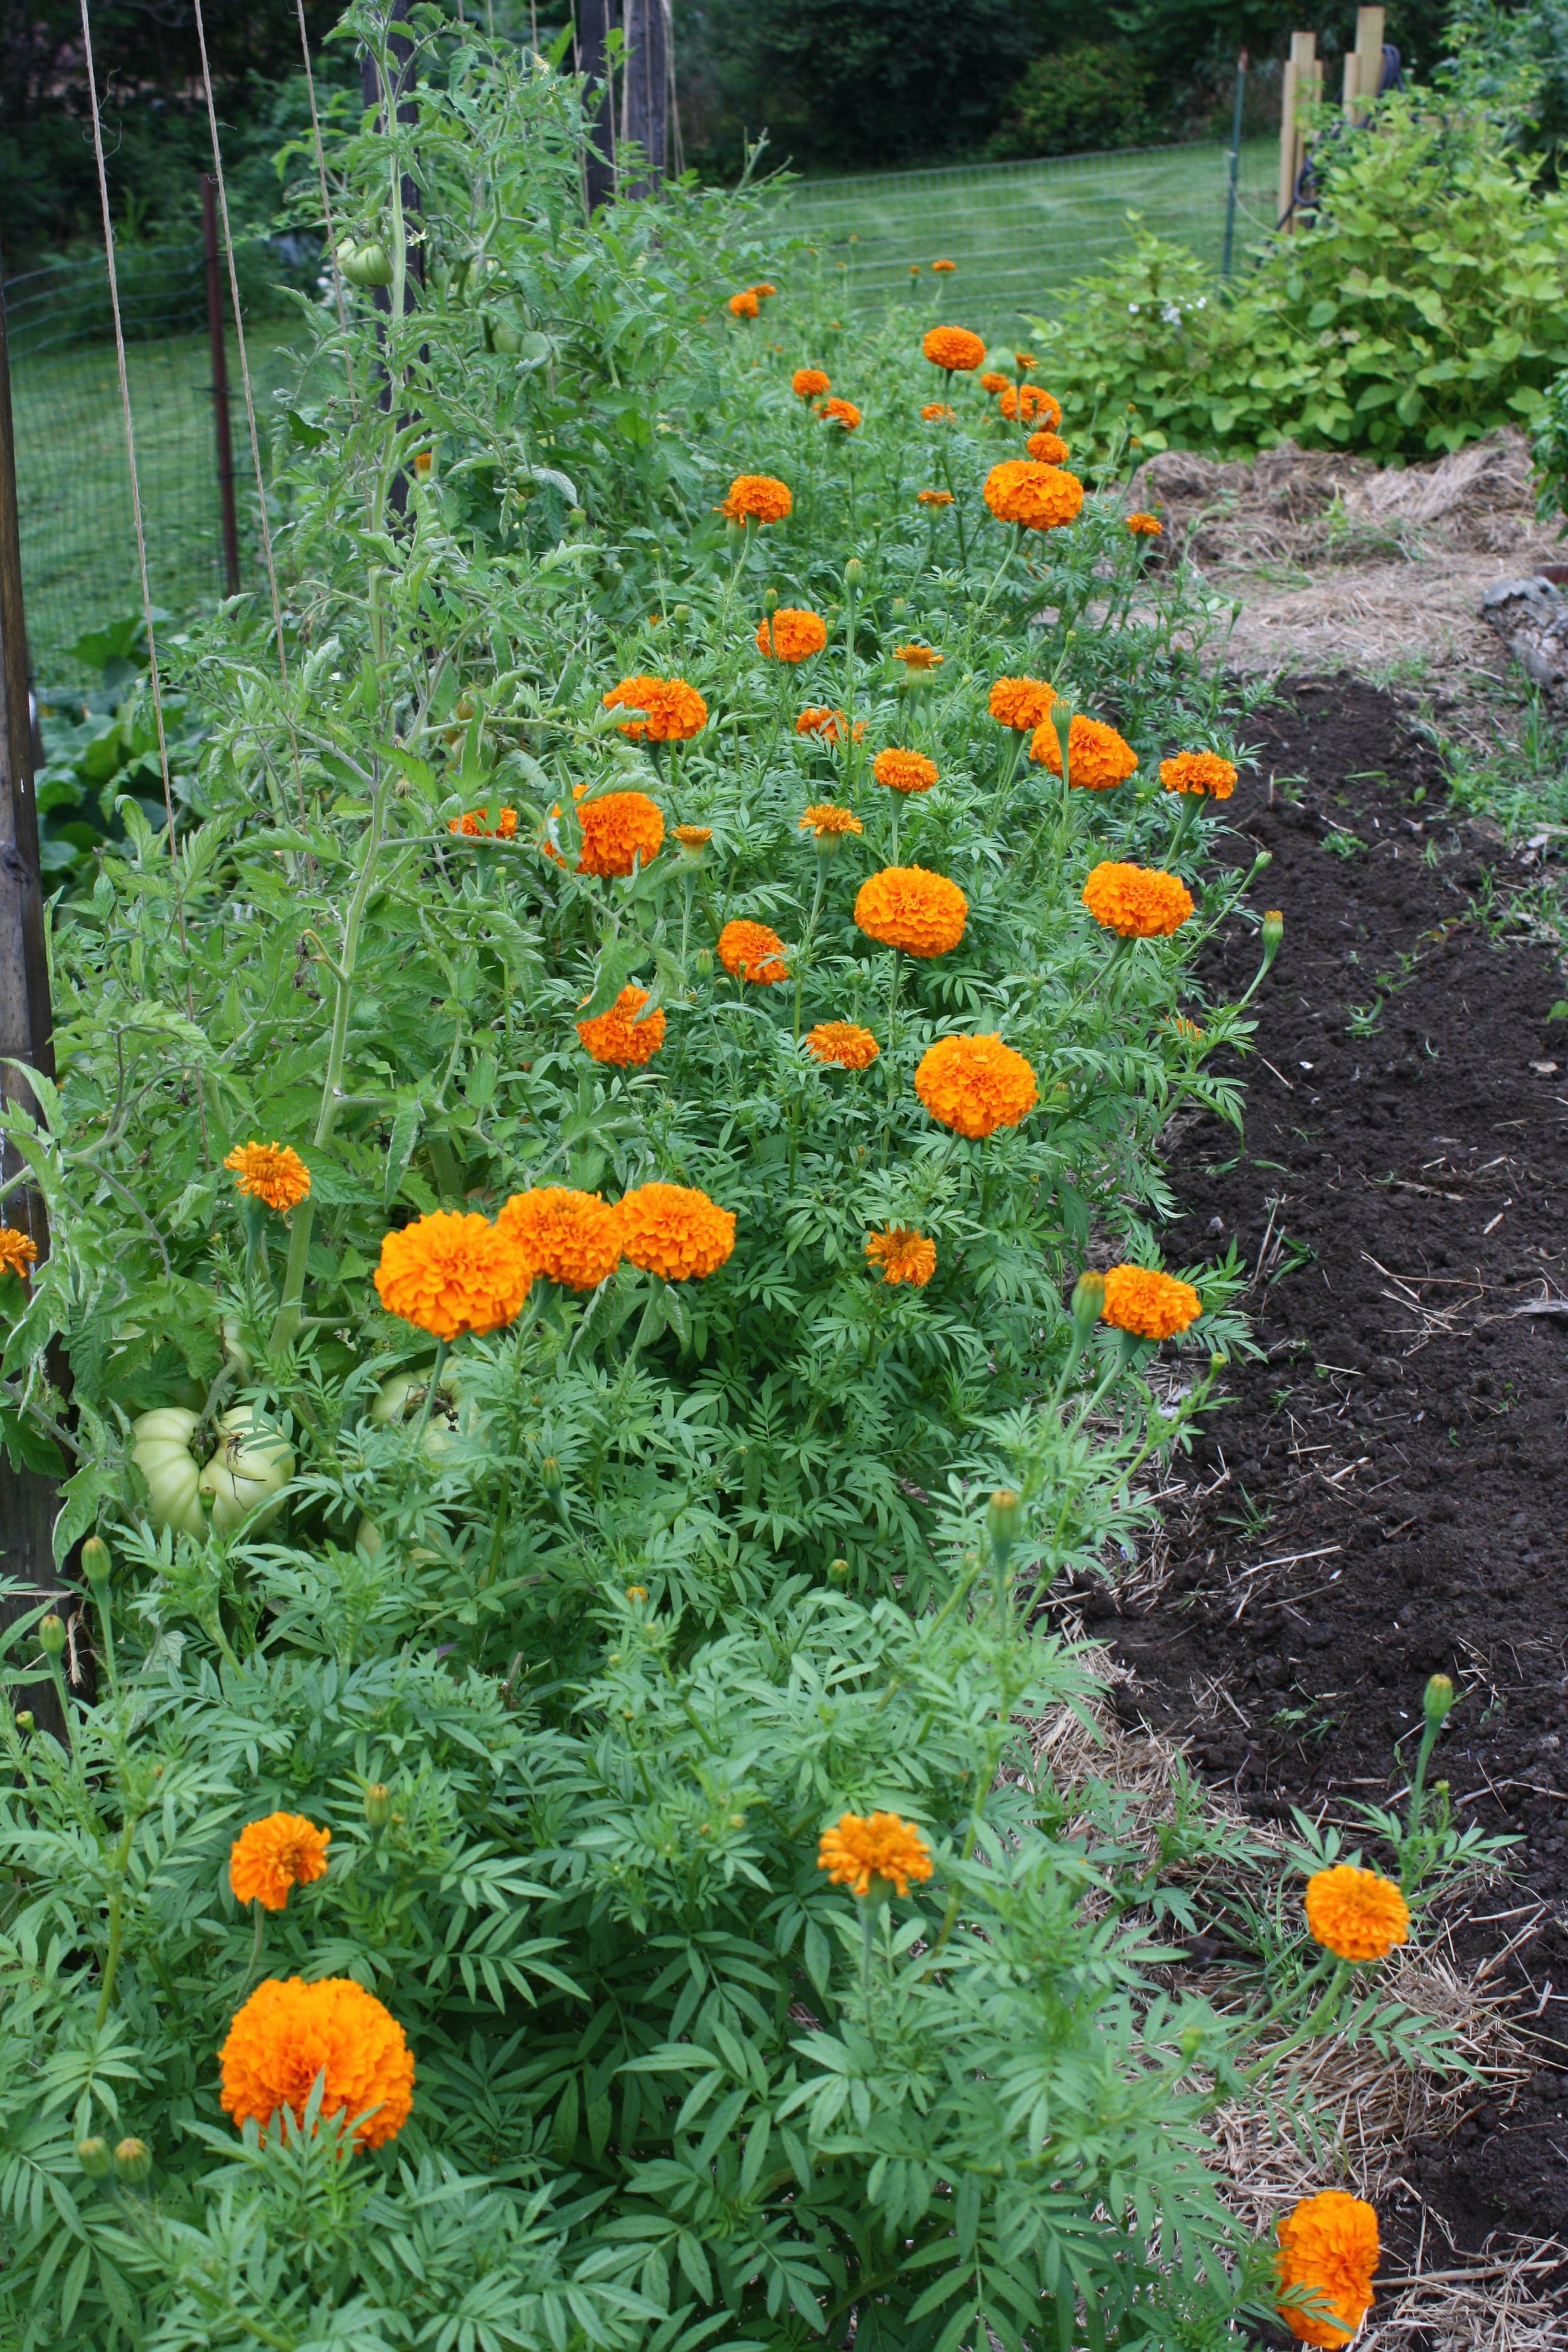 'Giant Orange' French Marigolds beginning to bloom